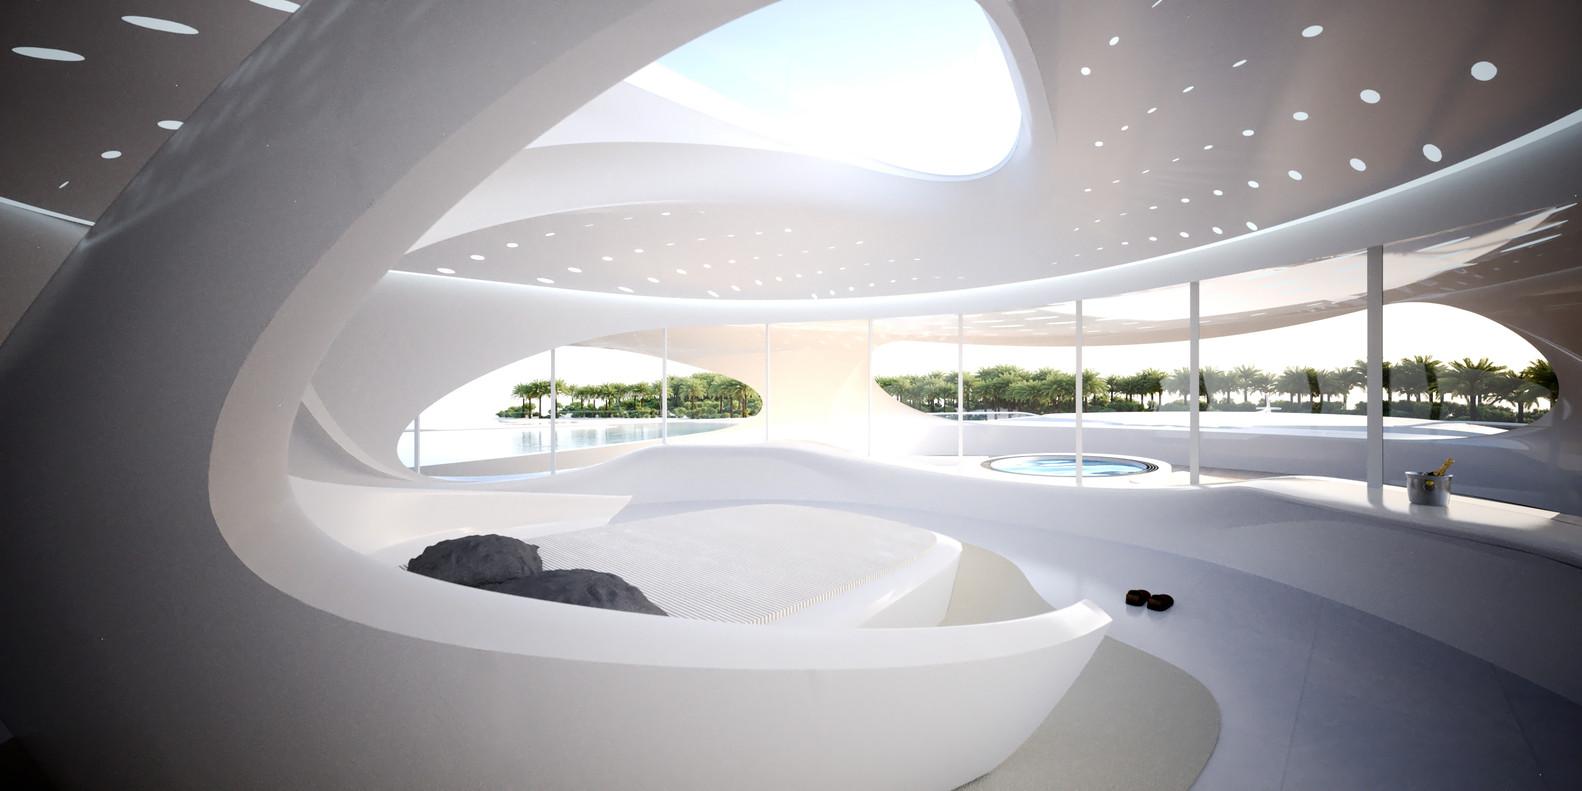 Captivating Zaha Hadid Designs Superyacht,© Unique Circle Yachts / Zaha Hadid  Architects For Bloom+